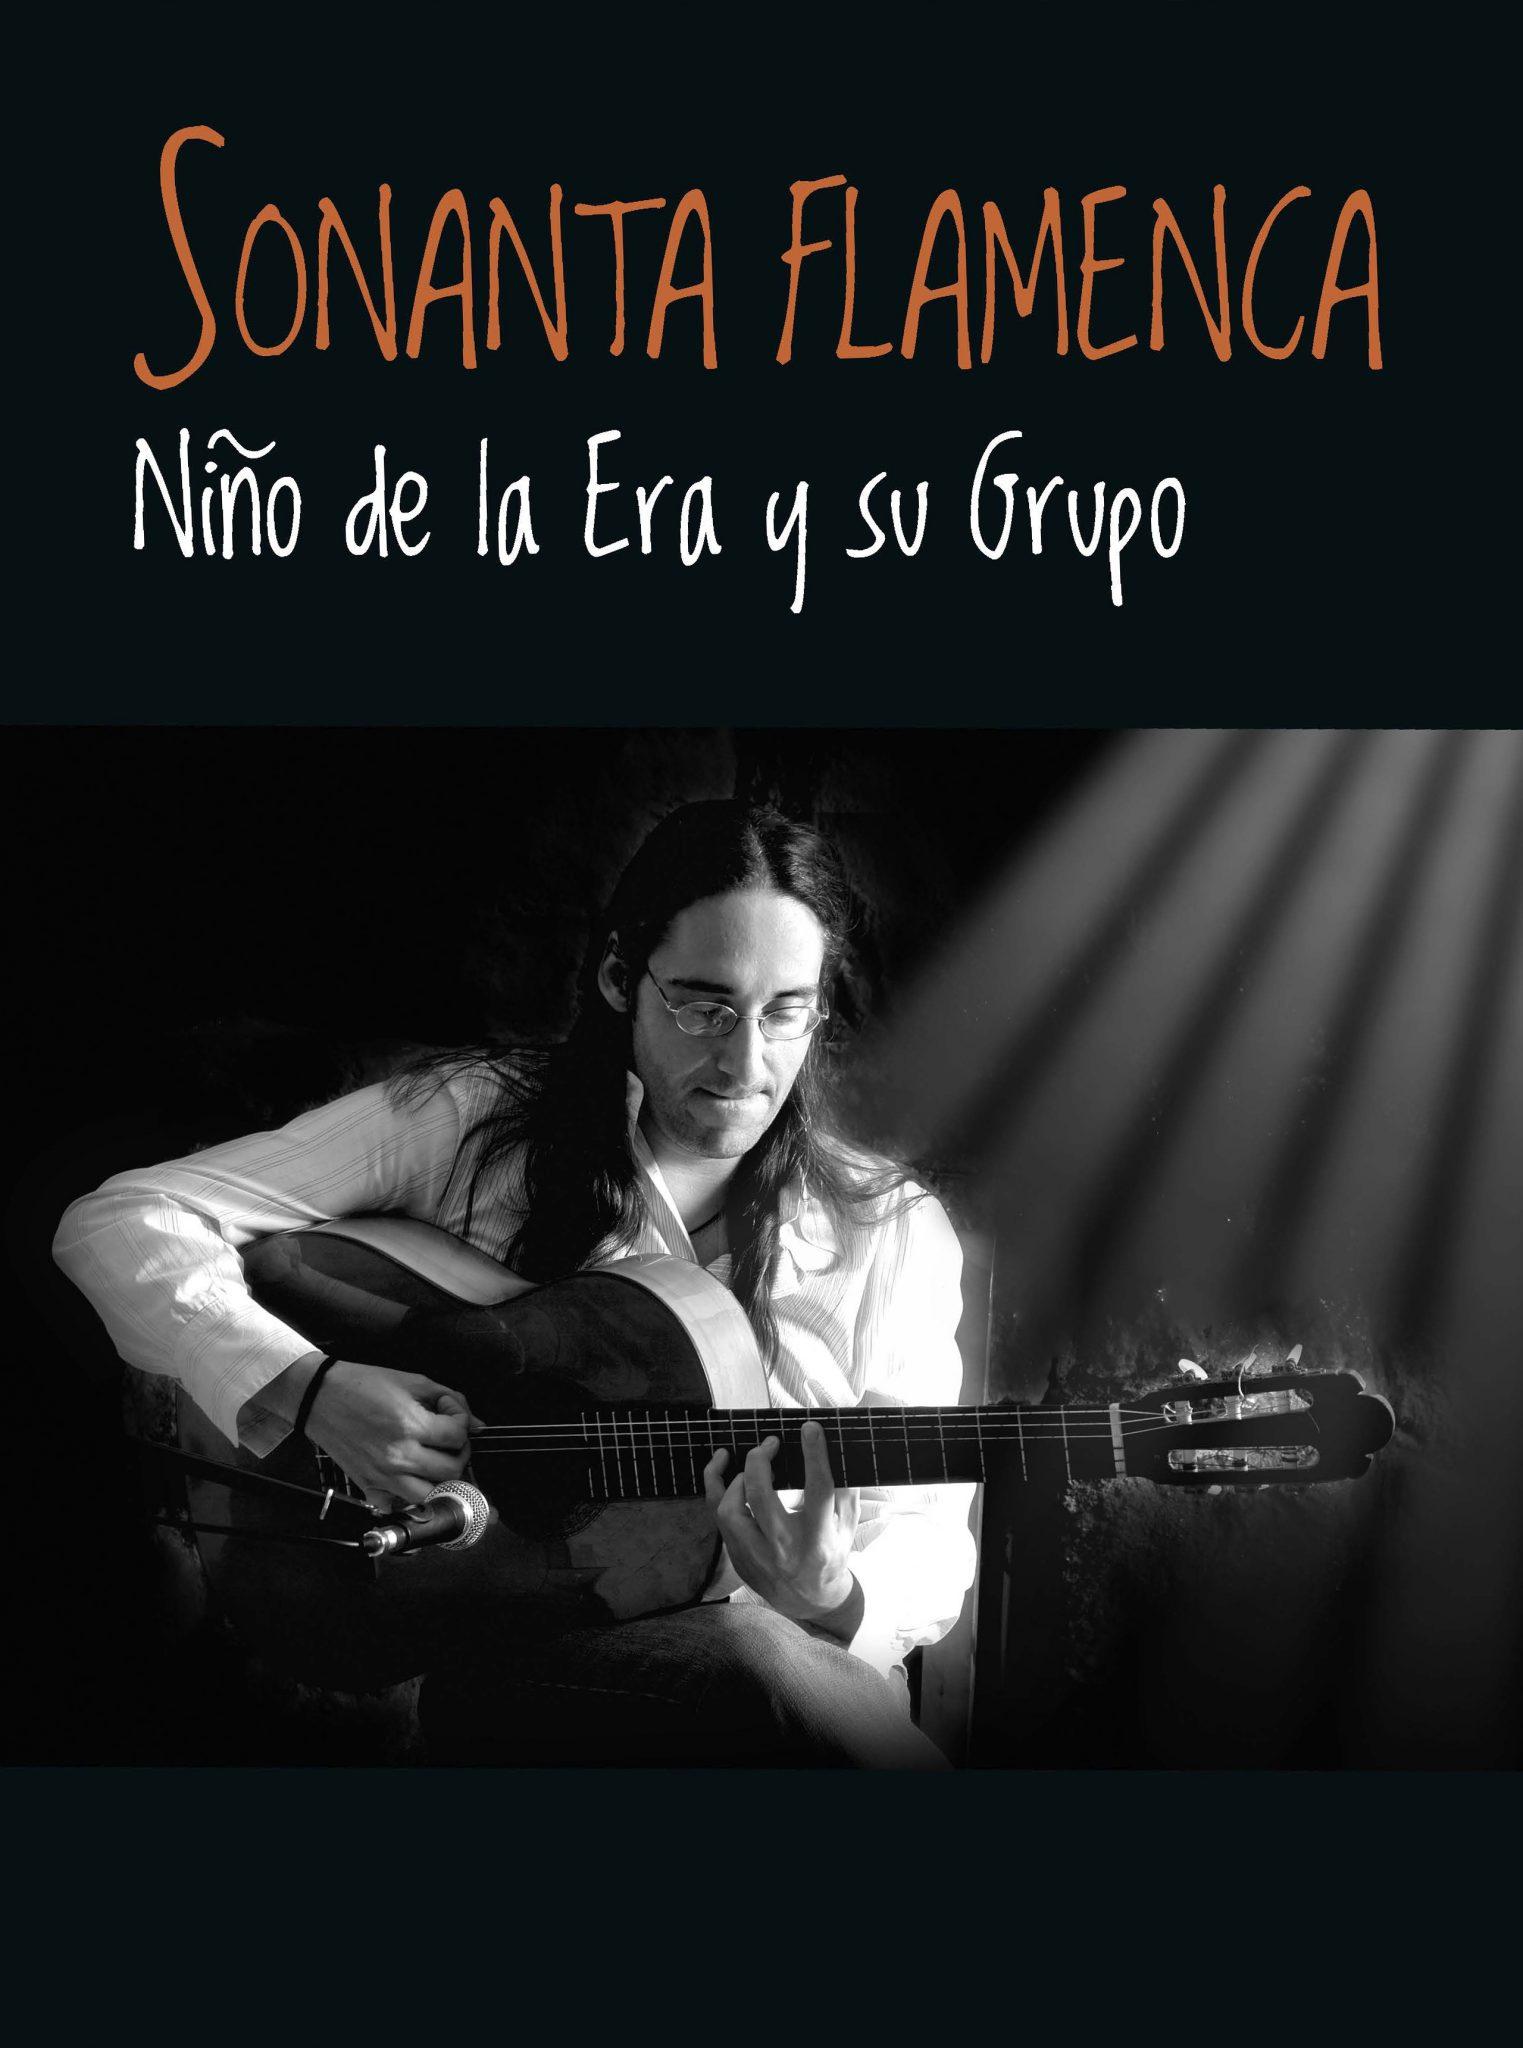 Flamenco: La Sonanta Flamenca del Niño de la Era